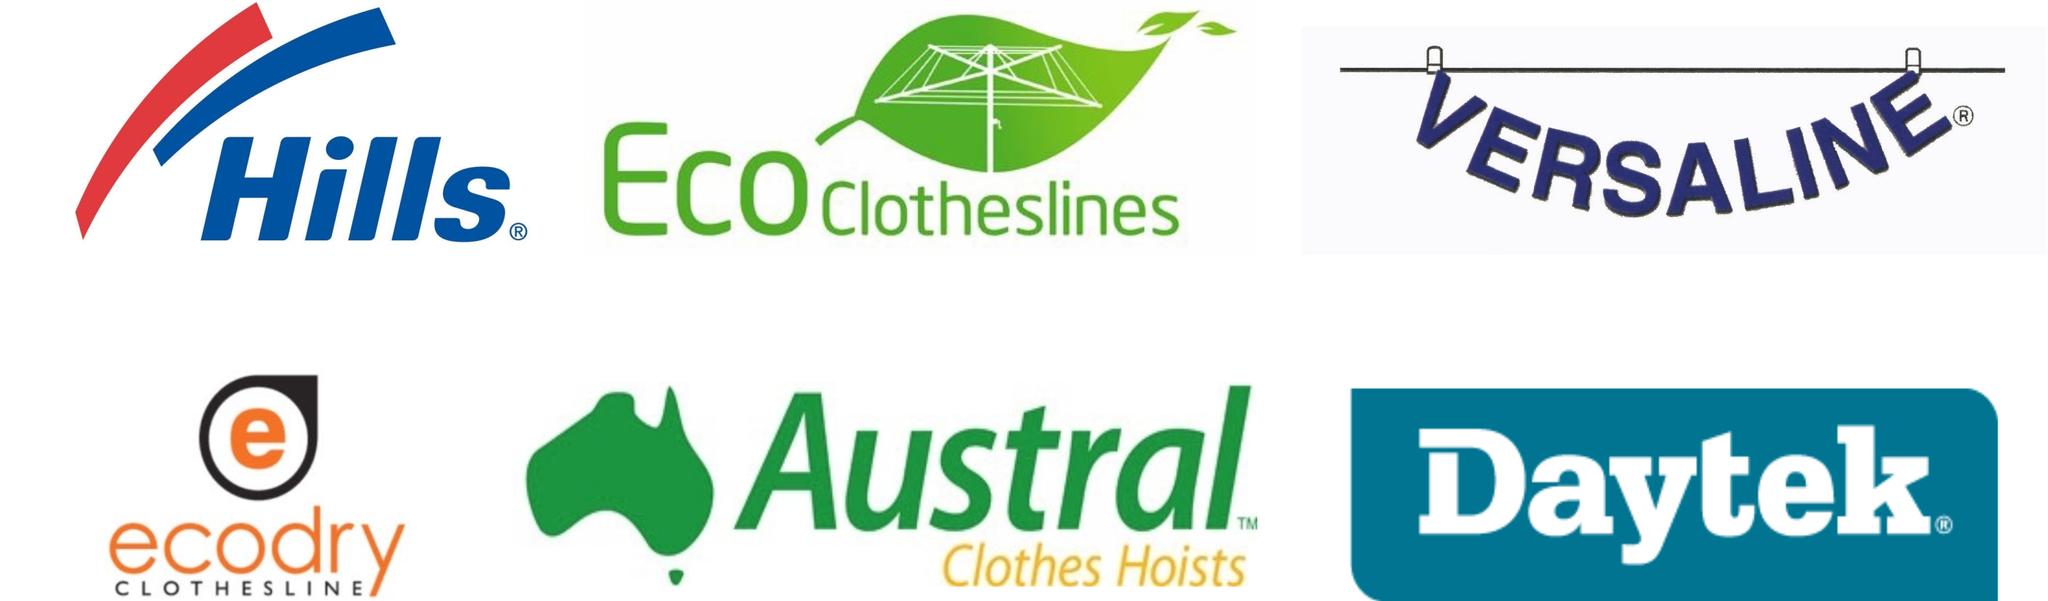 clotheslines_hills_Eco_versaline_ecodry_austral_daytek